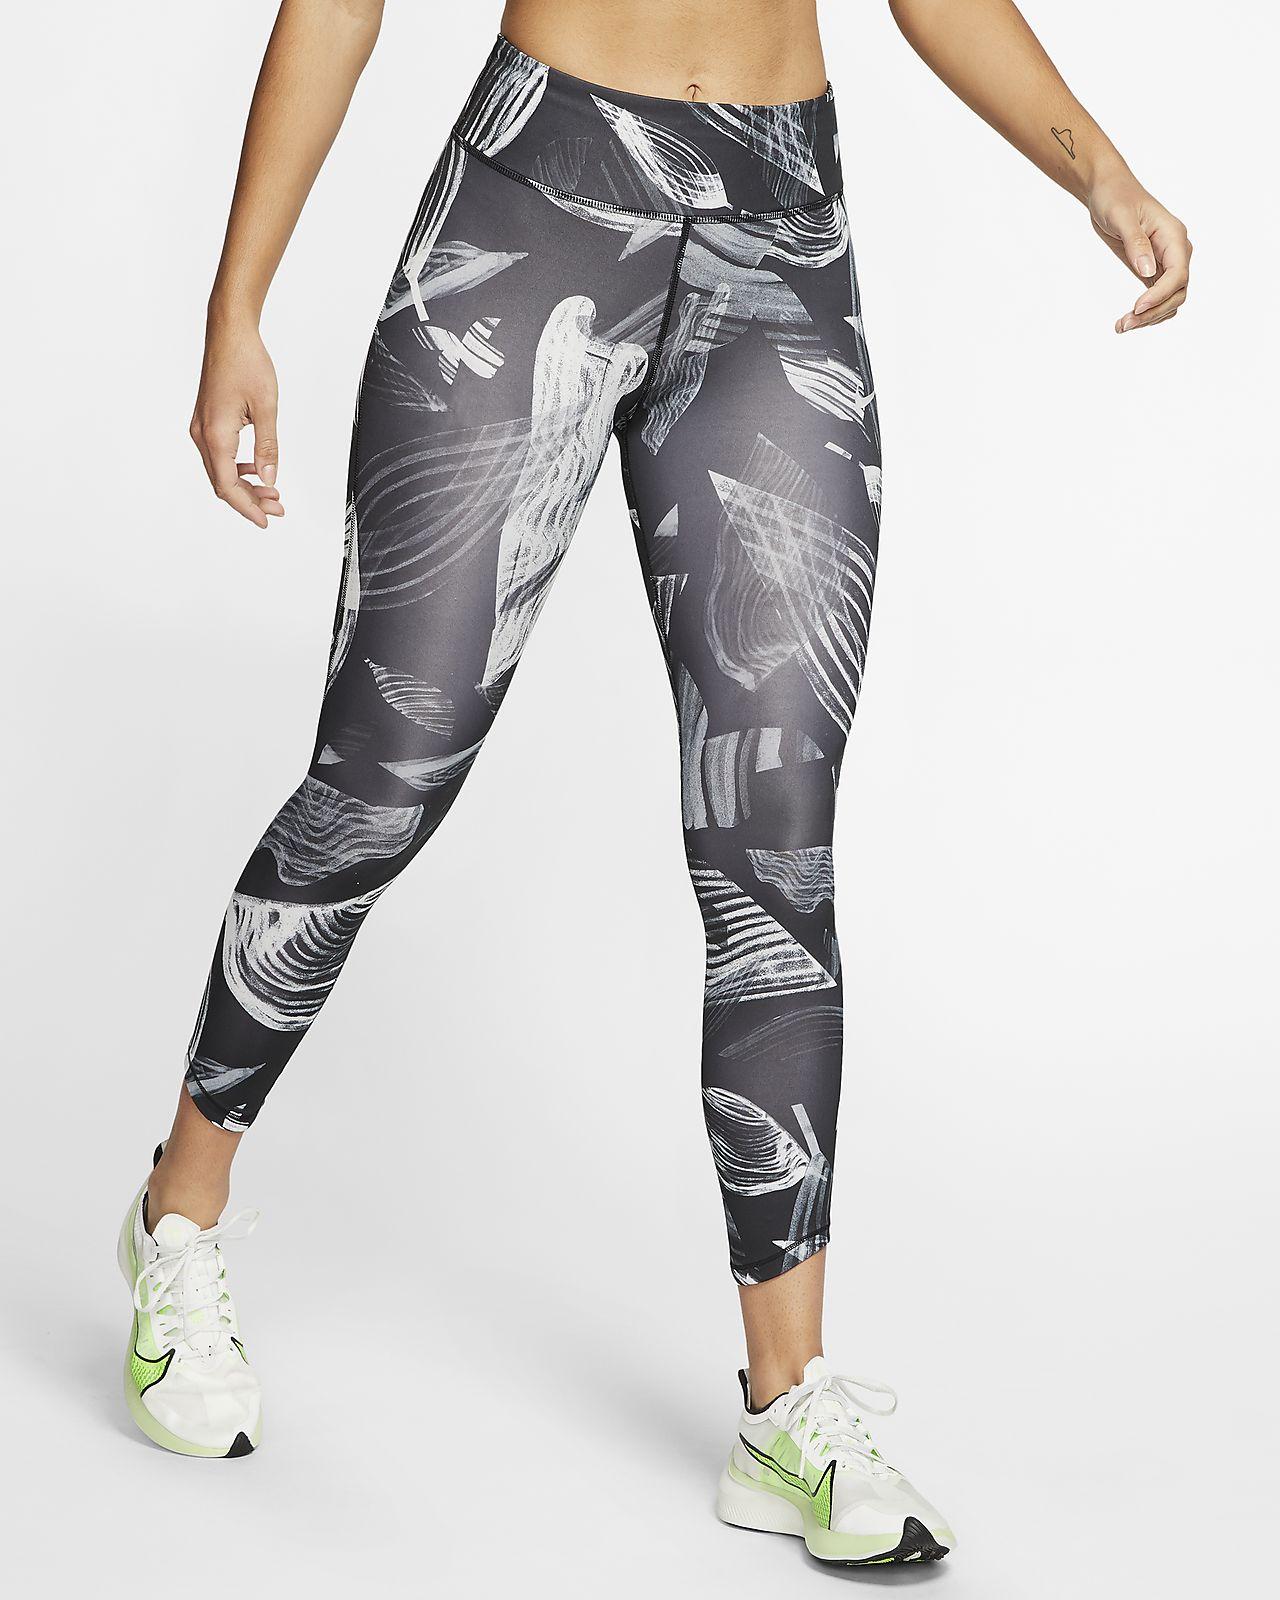 le Femme Survêtement Leggins Leggings afficher Gym Legging